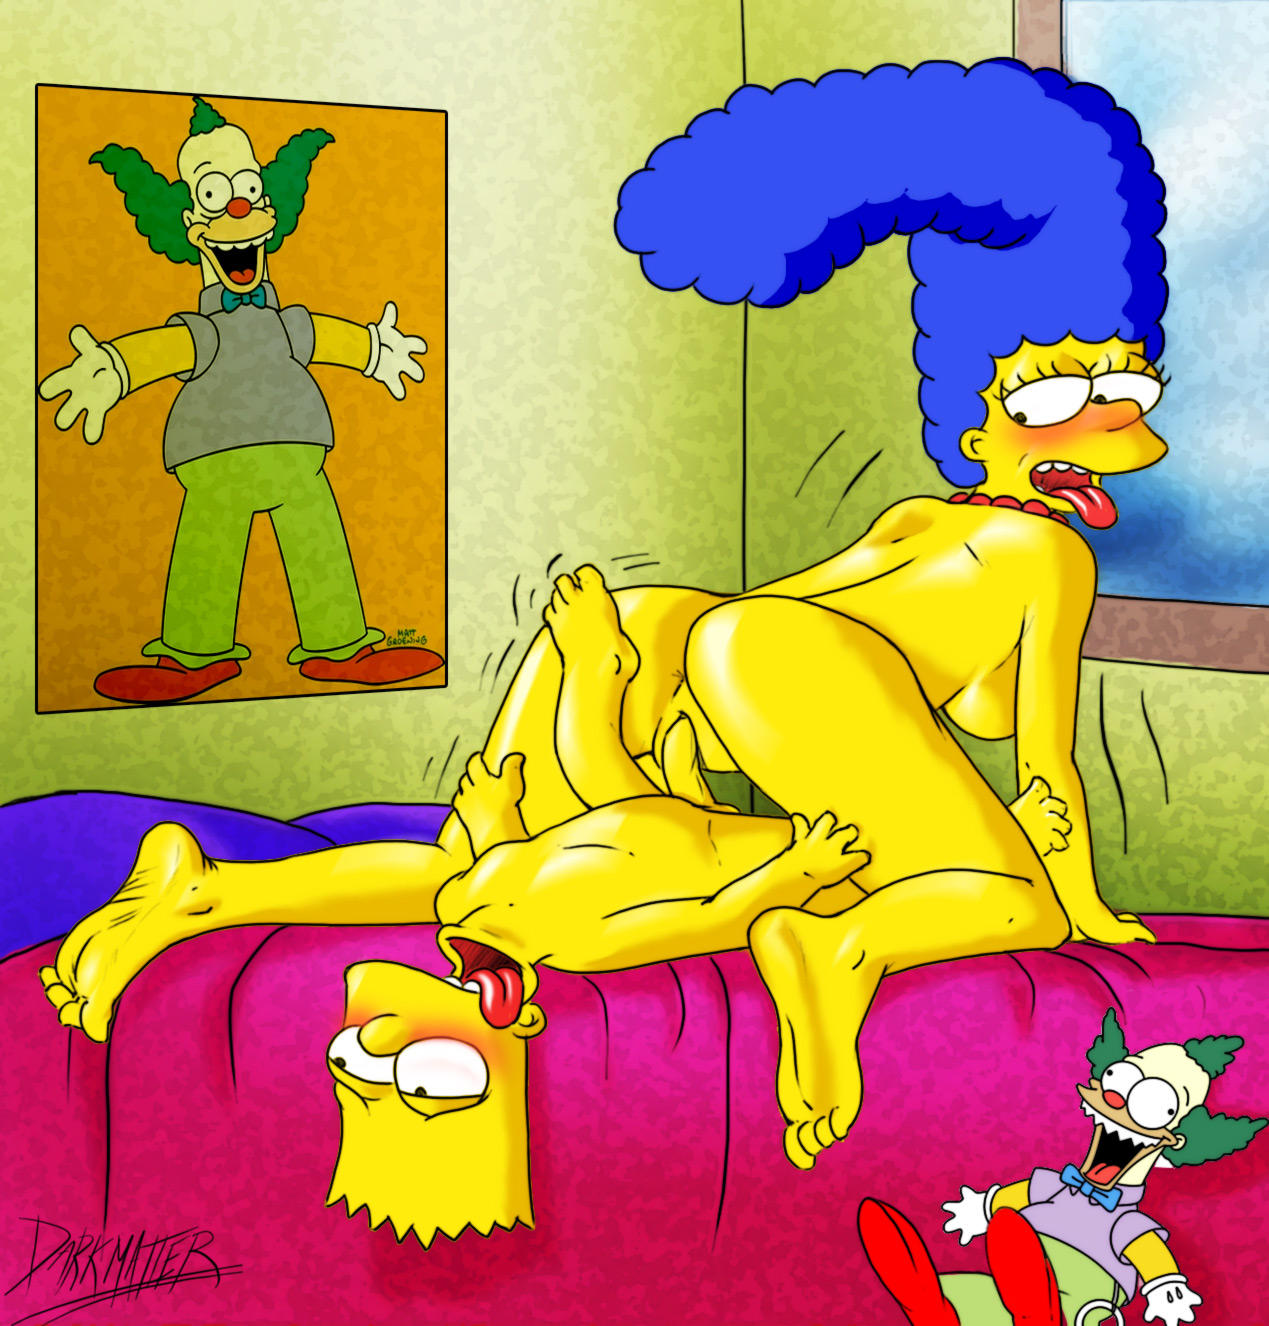 148_341022_Bart_Simpson_Darkmatter_Marge_Simpson_The_Simpsons